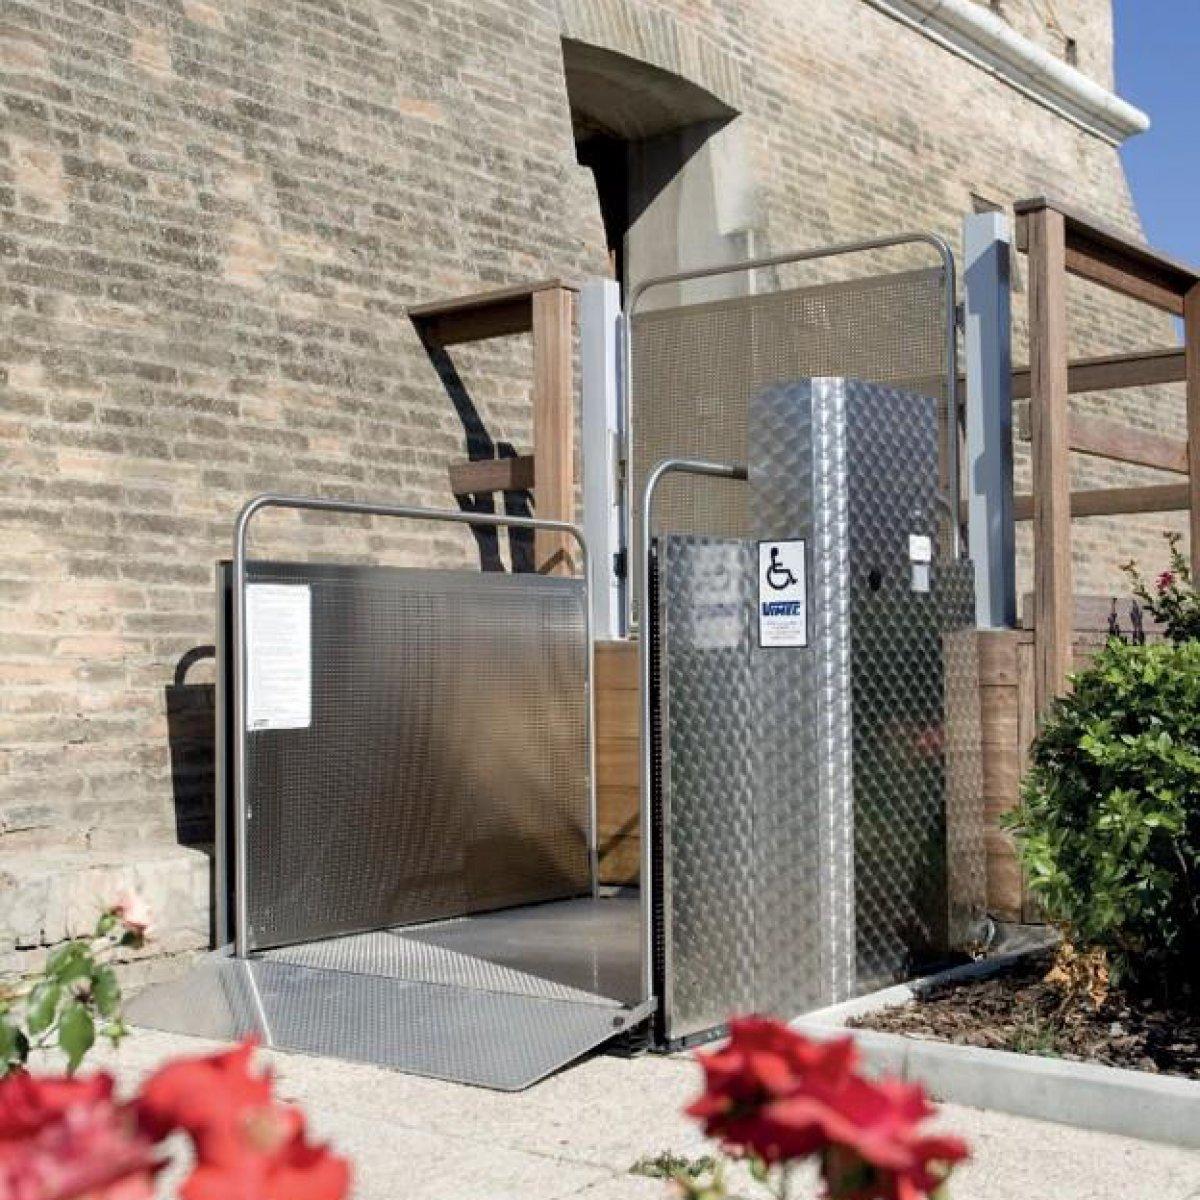 Vertical Platform Lift outside building Platform Lifts | Simplex Elevators Gallery Image 1